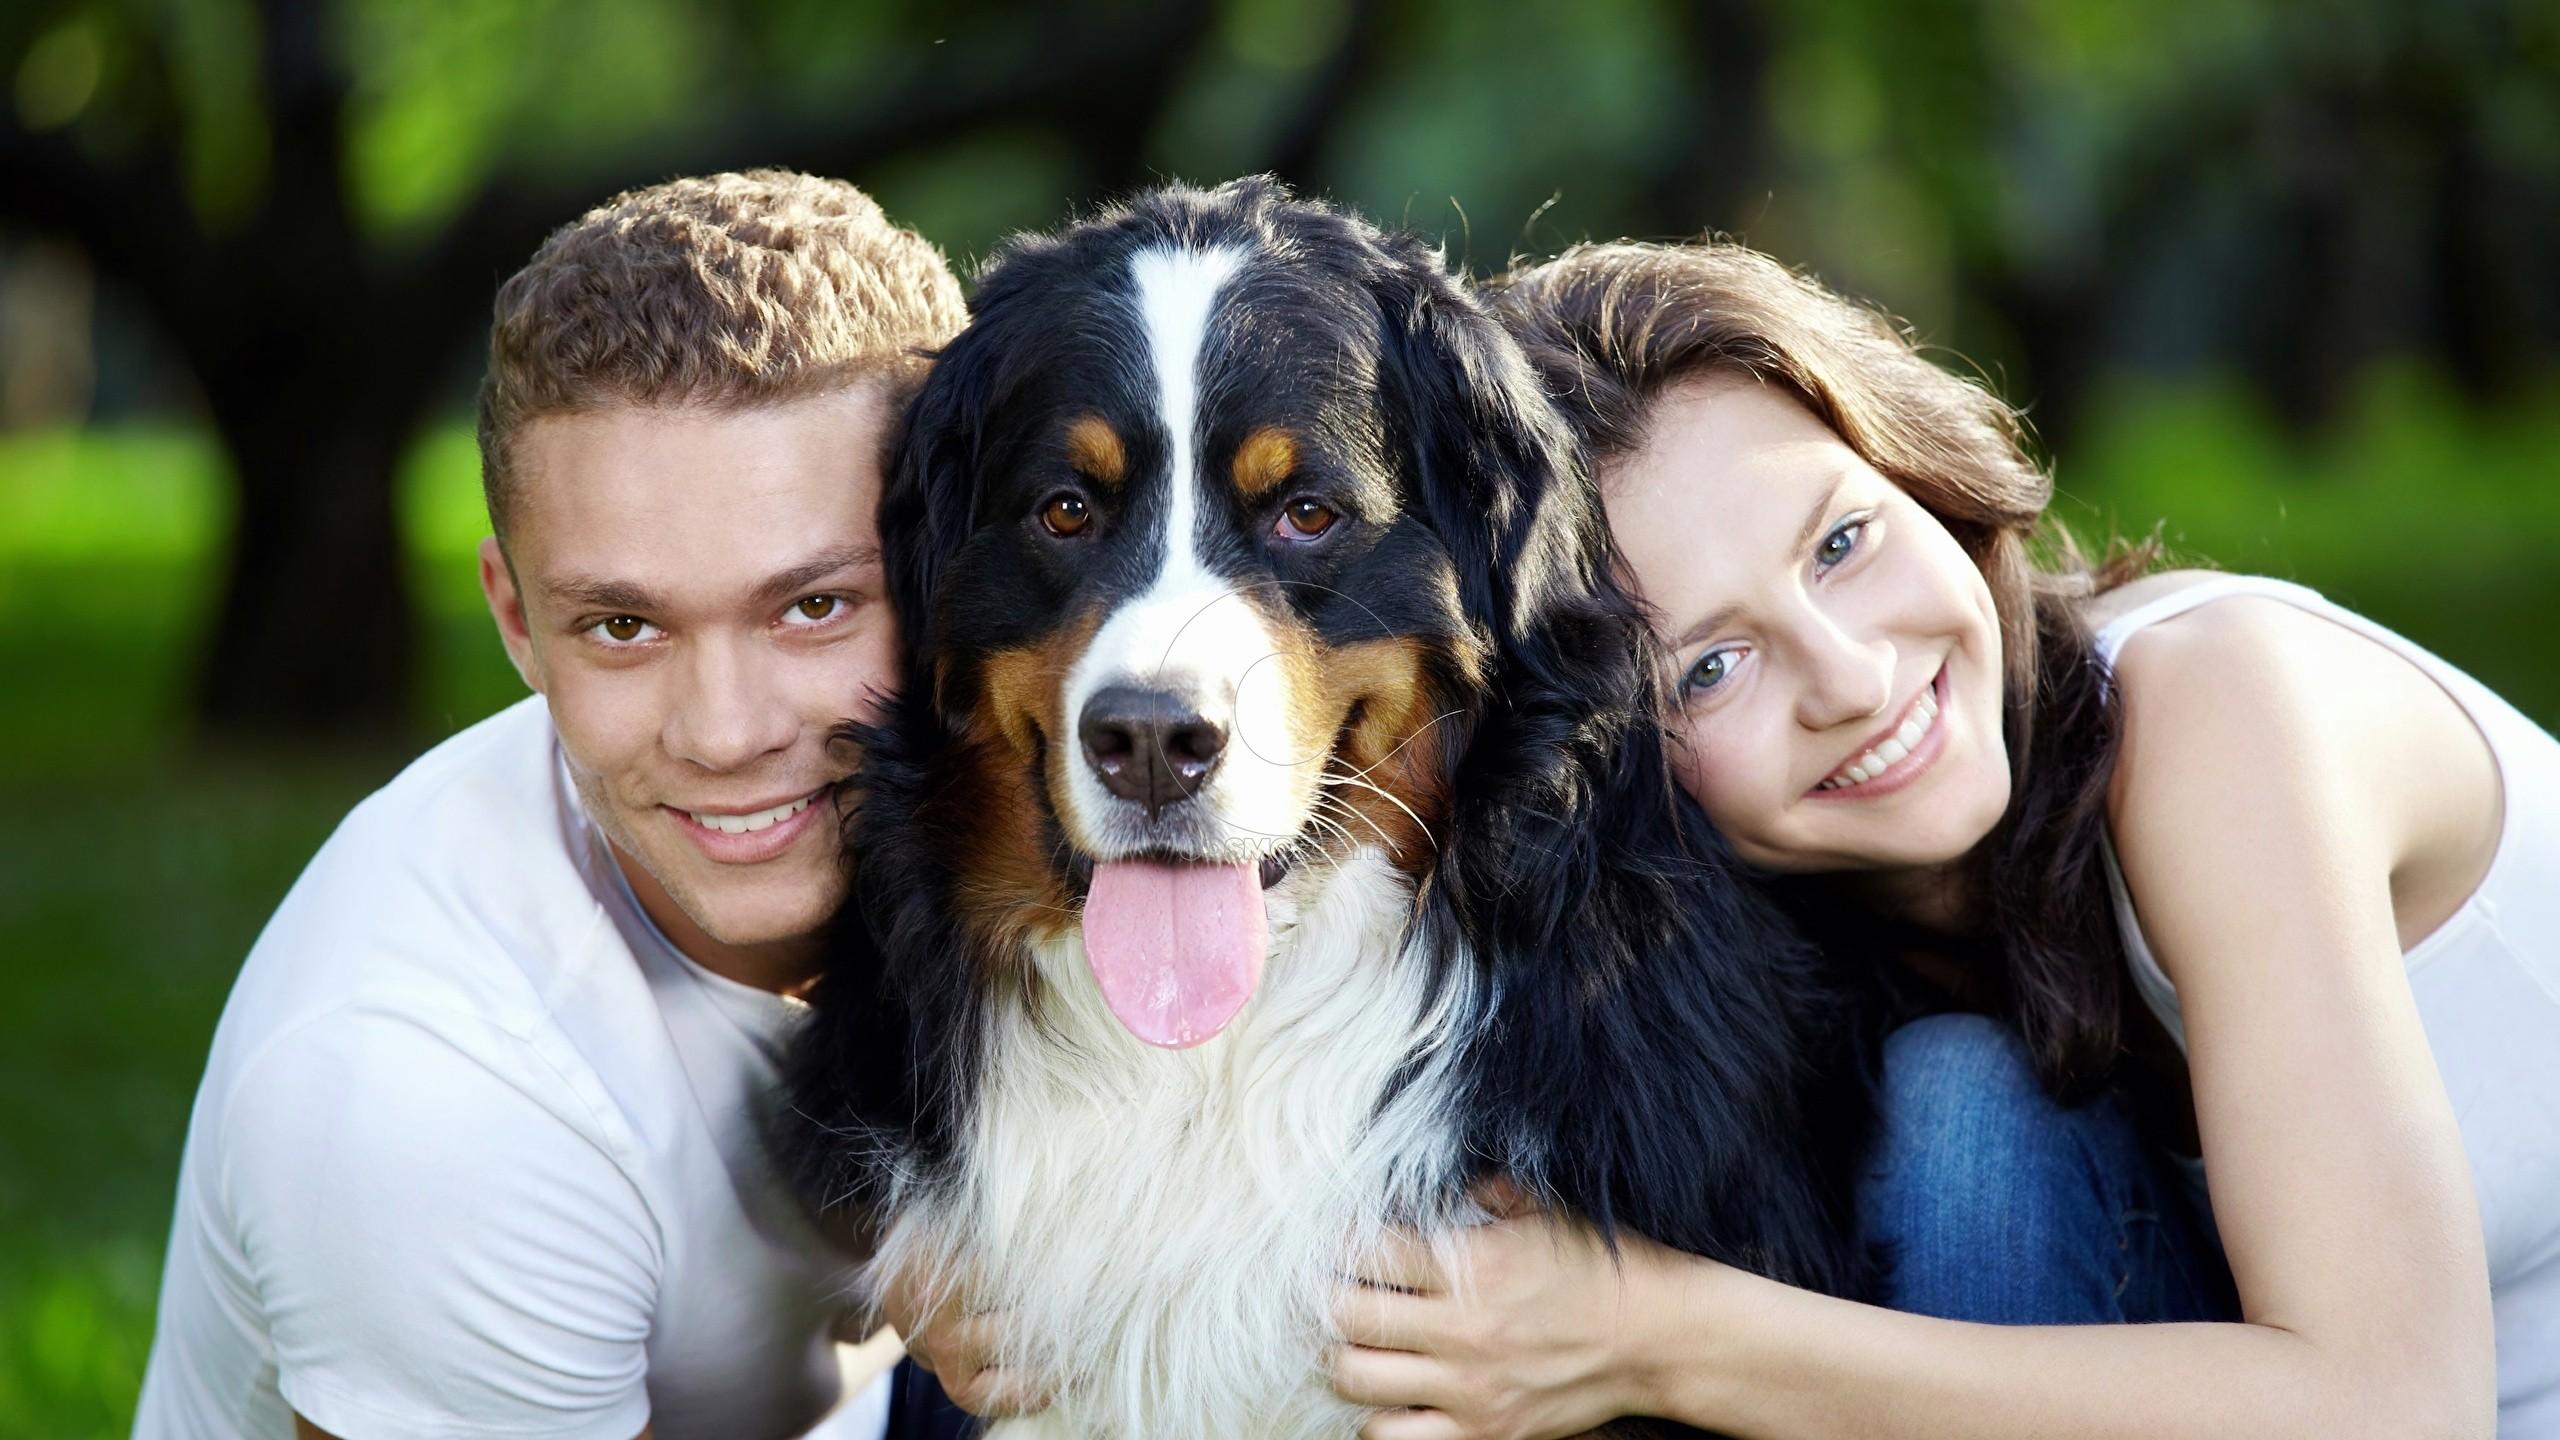 Dogs_Men_Smile_511921_2560x1440